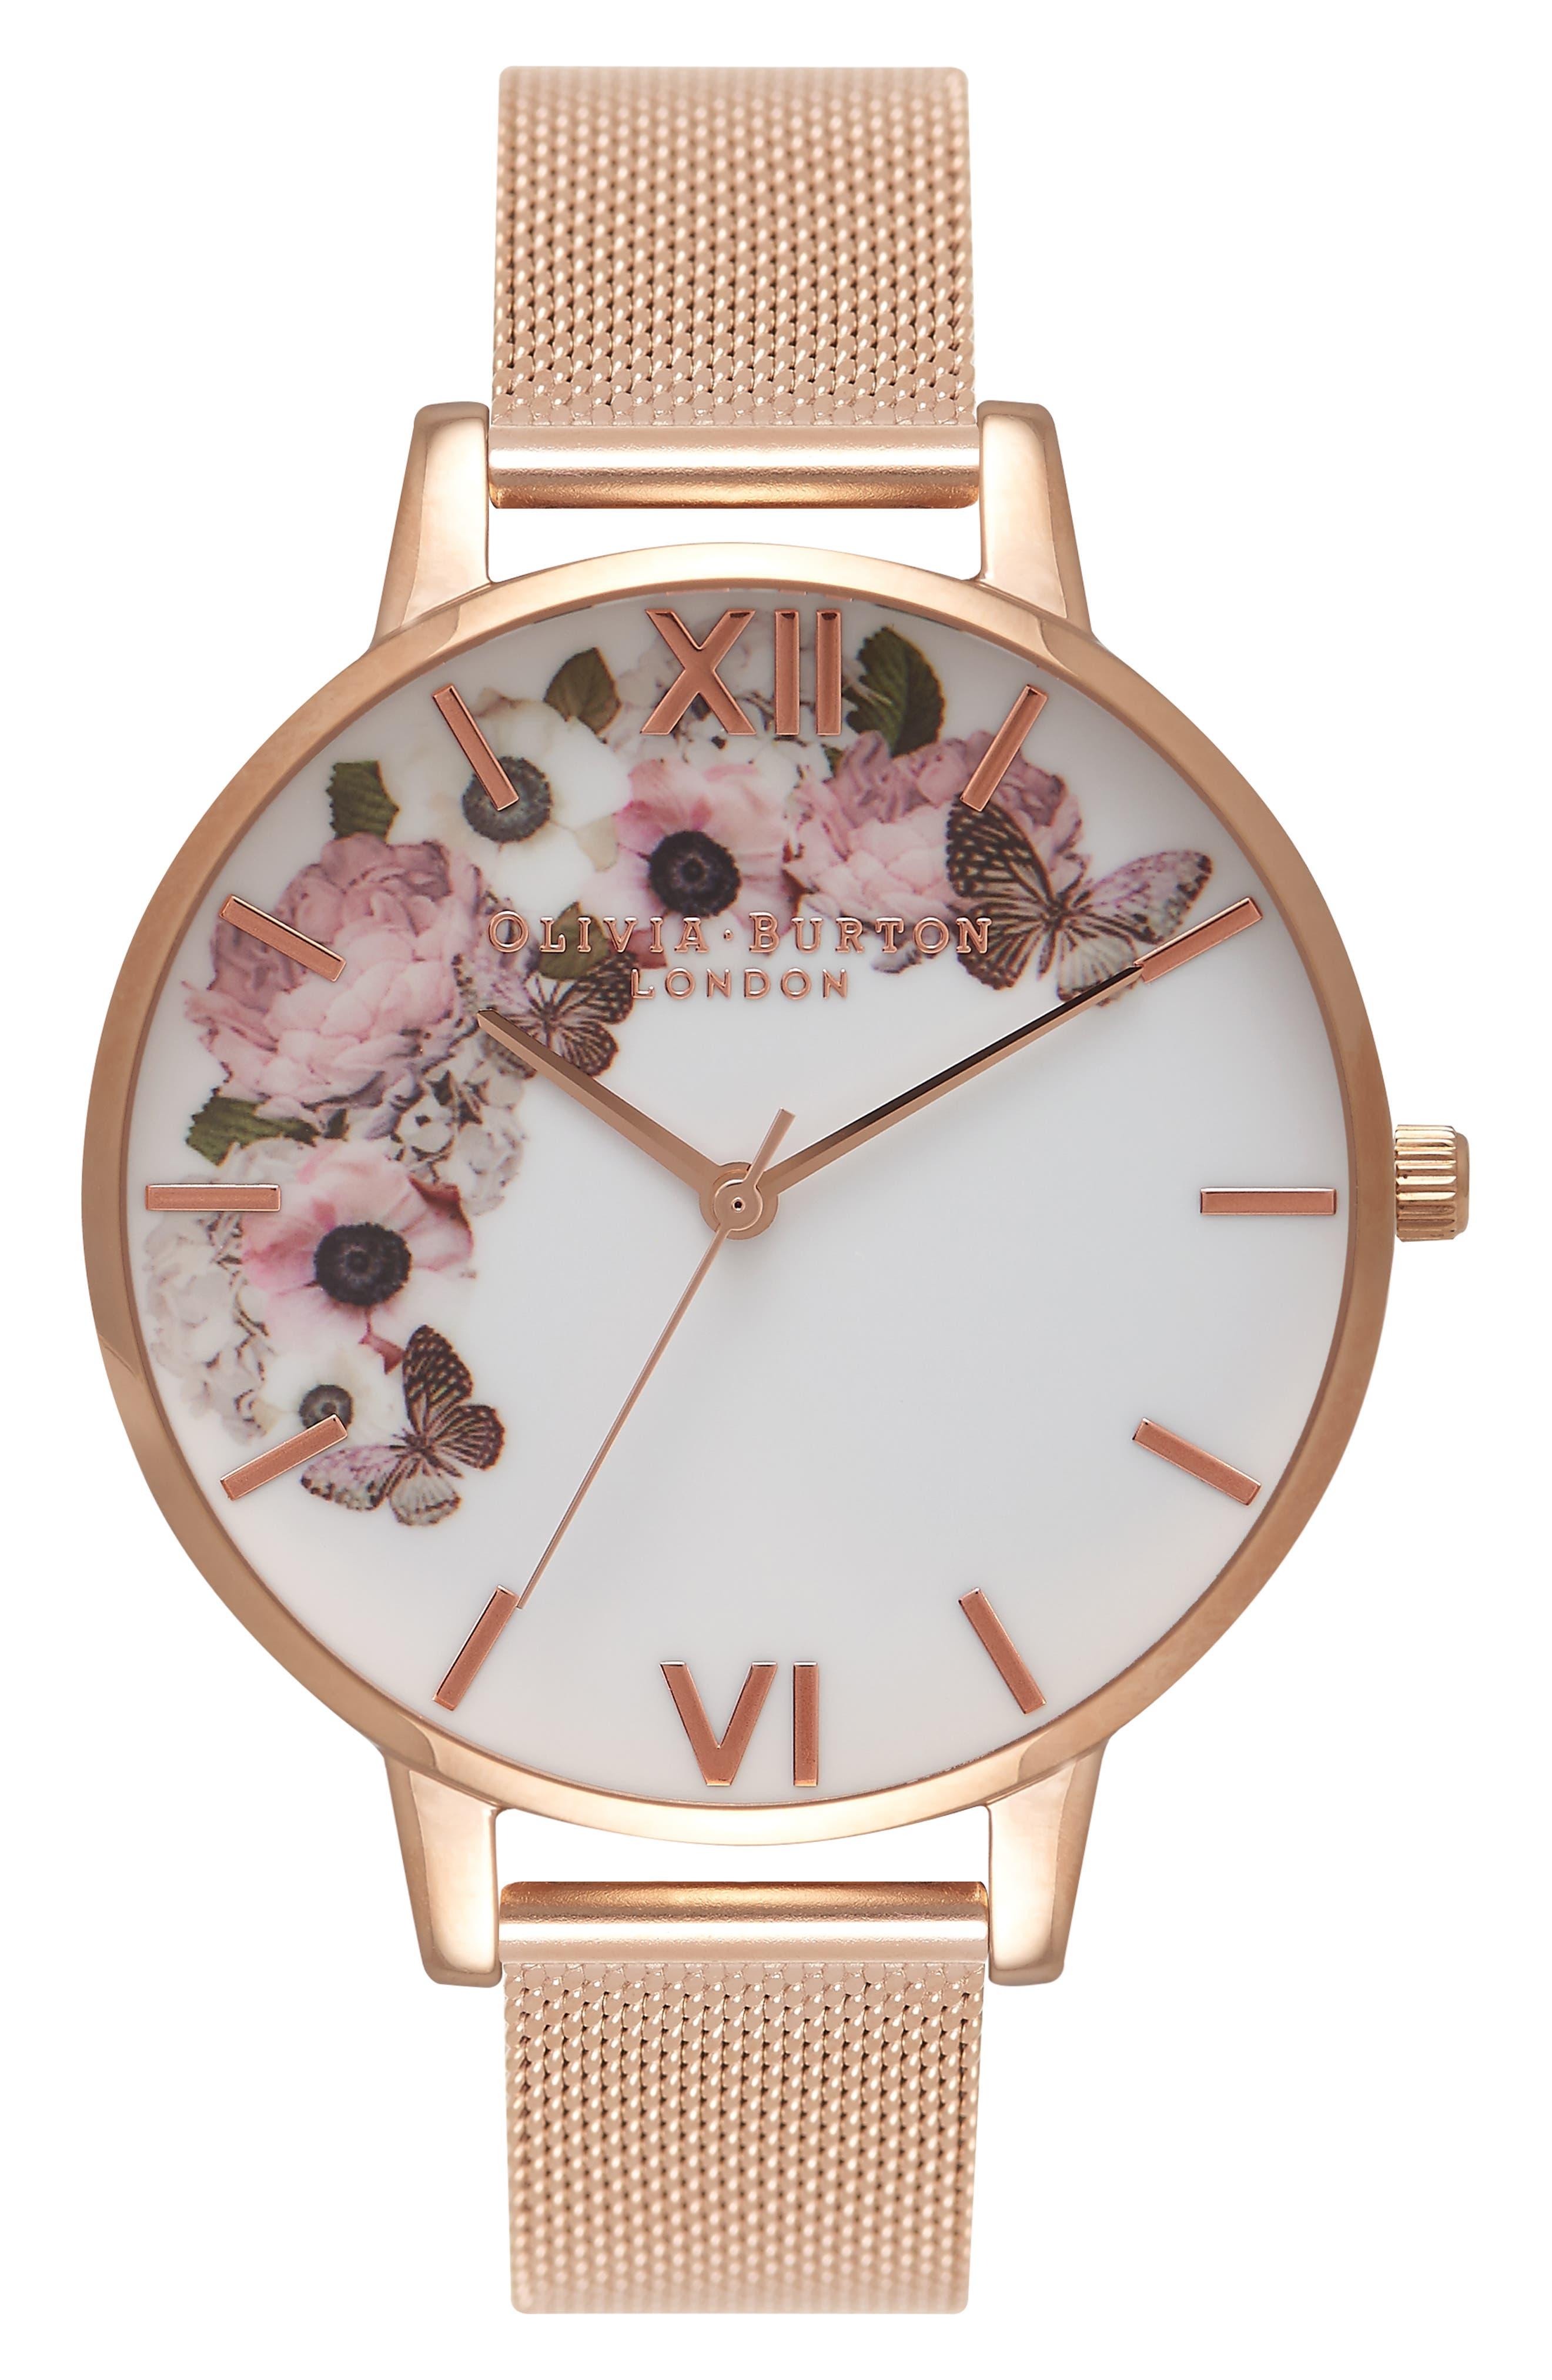 OLIVIA BURTON, Signature Florals Mesh Bracelet Watch, 38mm, Main thumbnail 1, color, ROSE GOLD/ ROSE GOLD/ WHITE